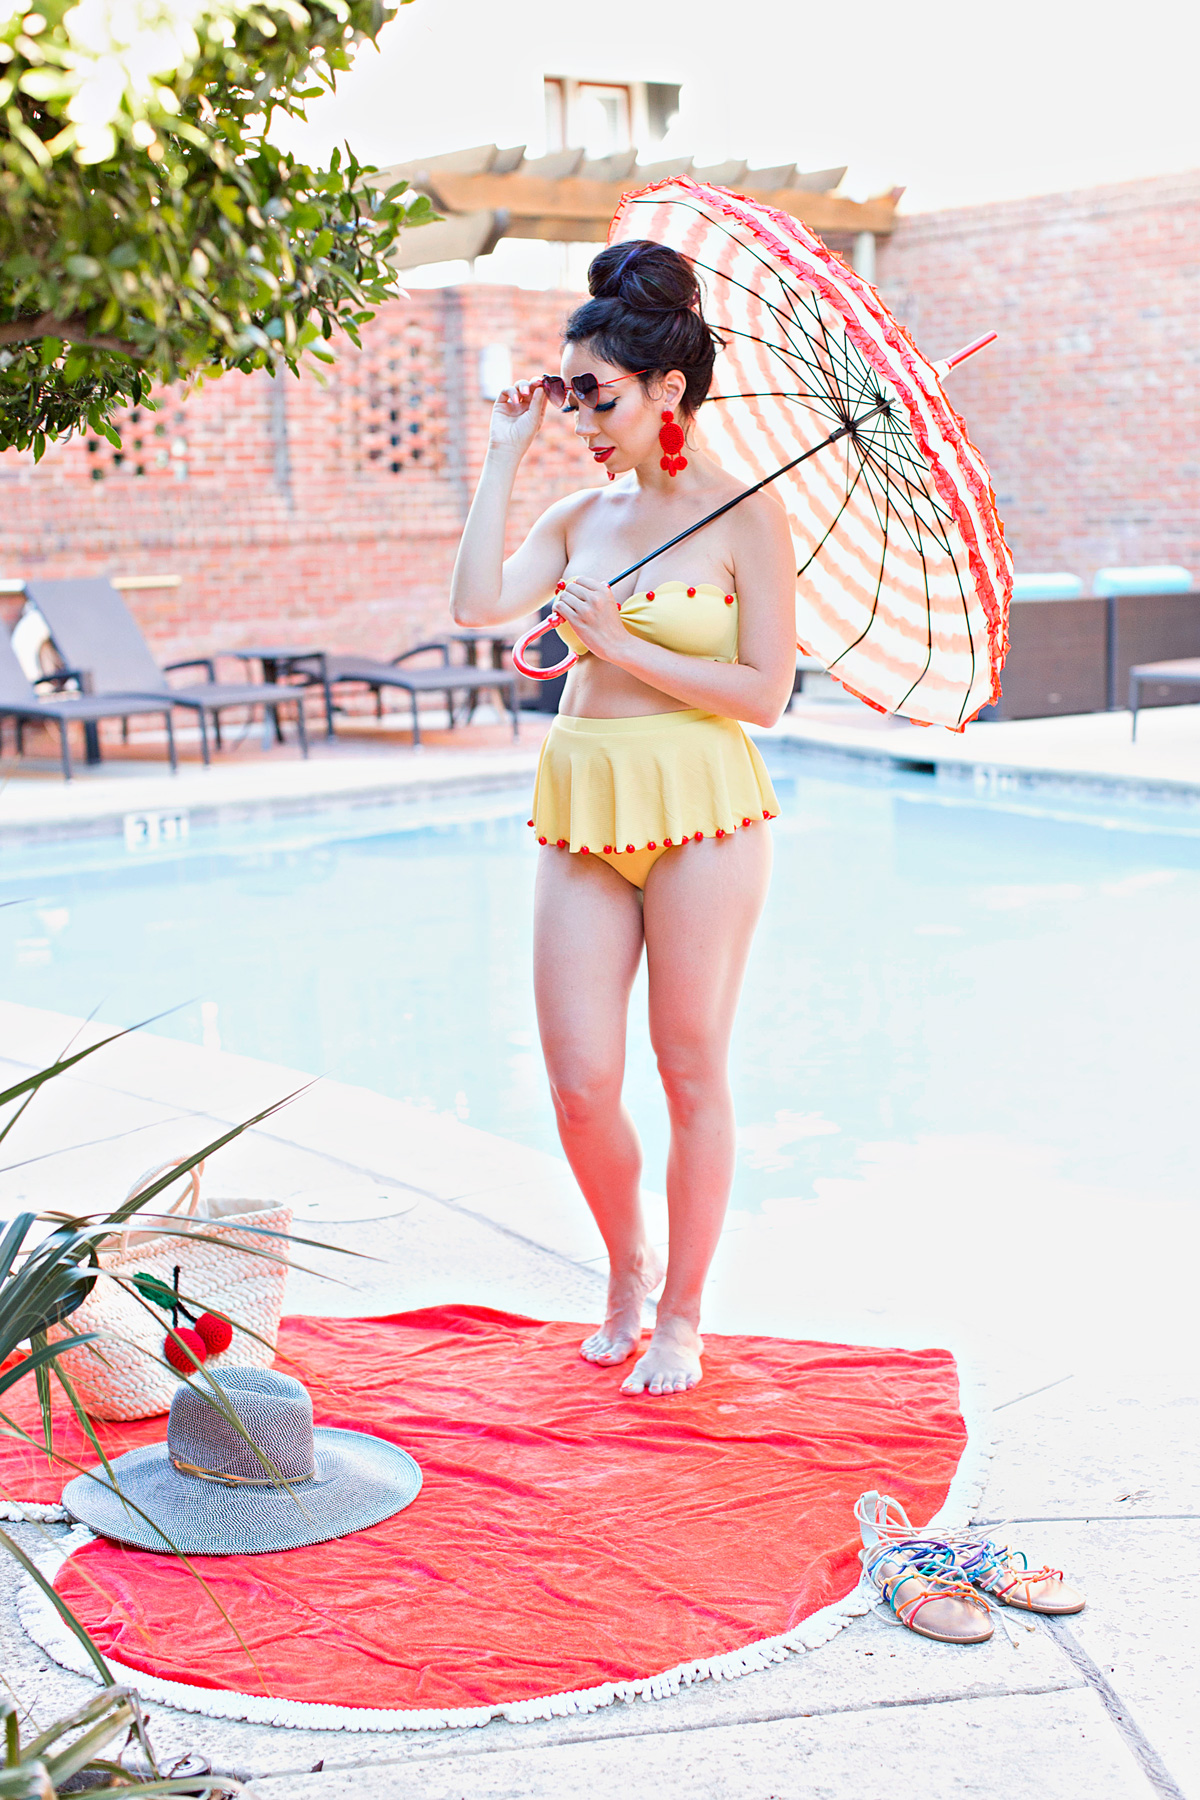 swimsuit series part 4 - marysia bathing suit